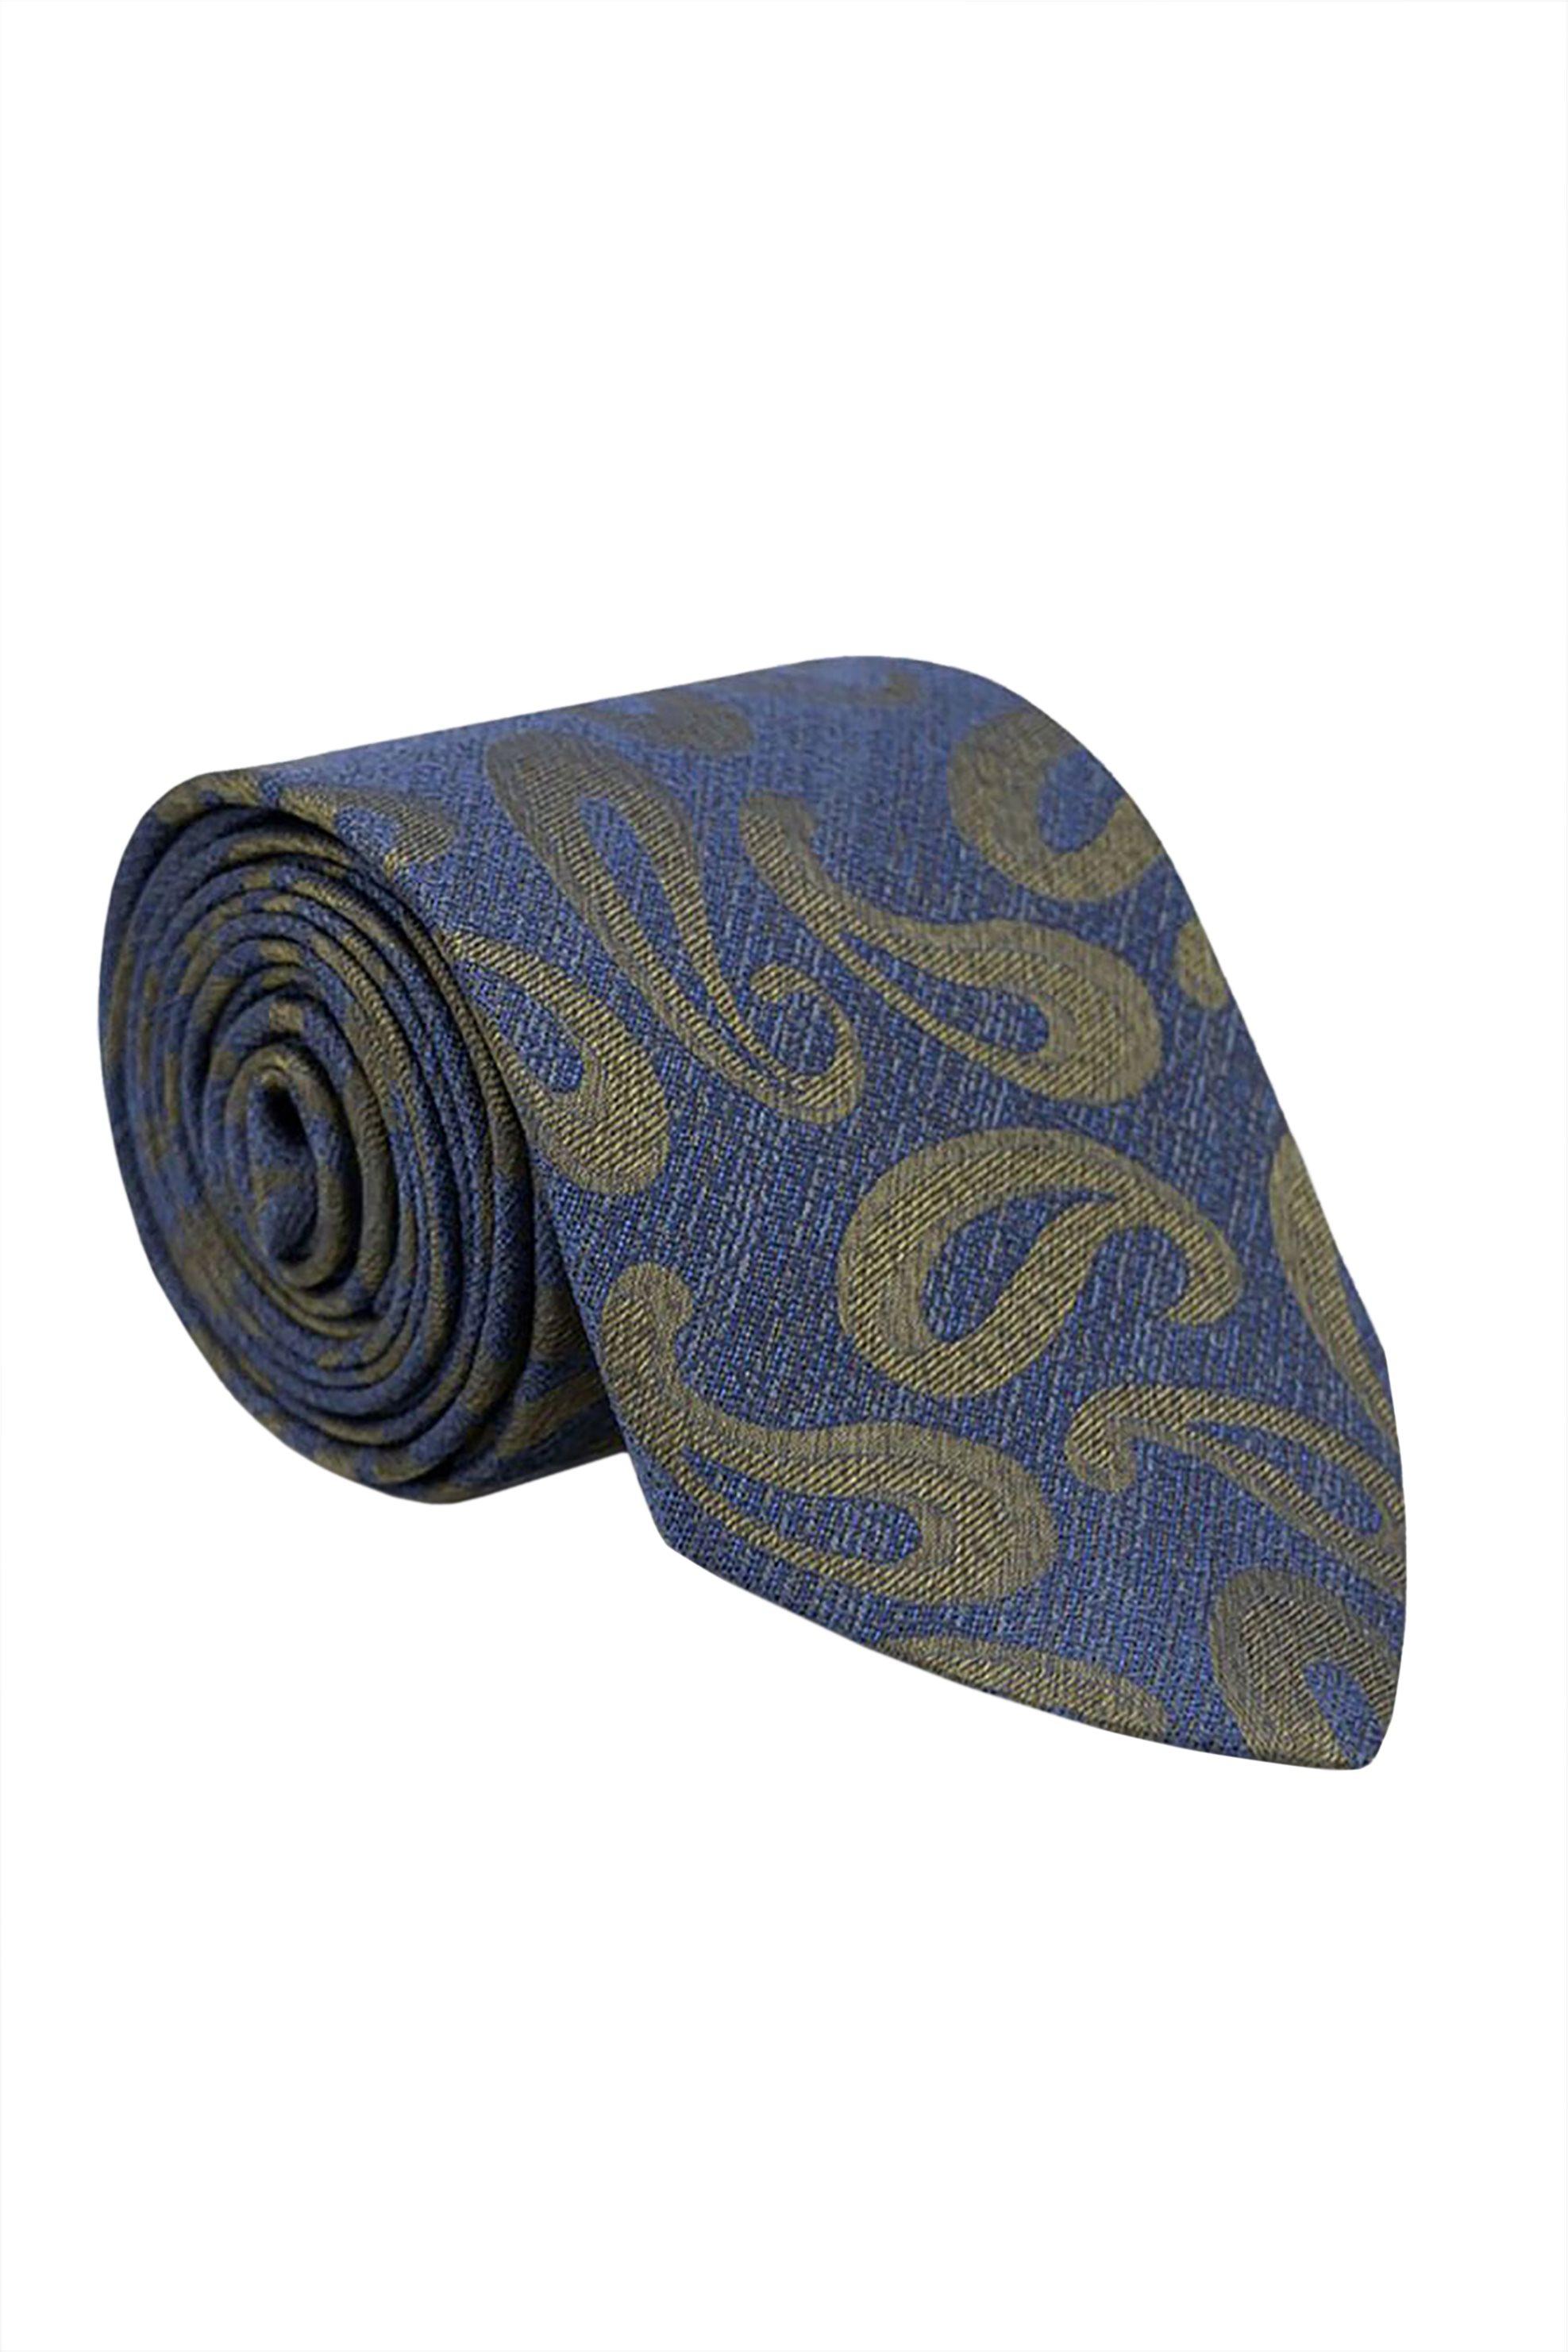 Oxford Company ανδρική μεταξωτή γραβάτα με all-over print - TIE51-414.03 - Μπλε